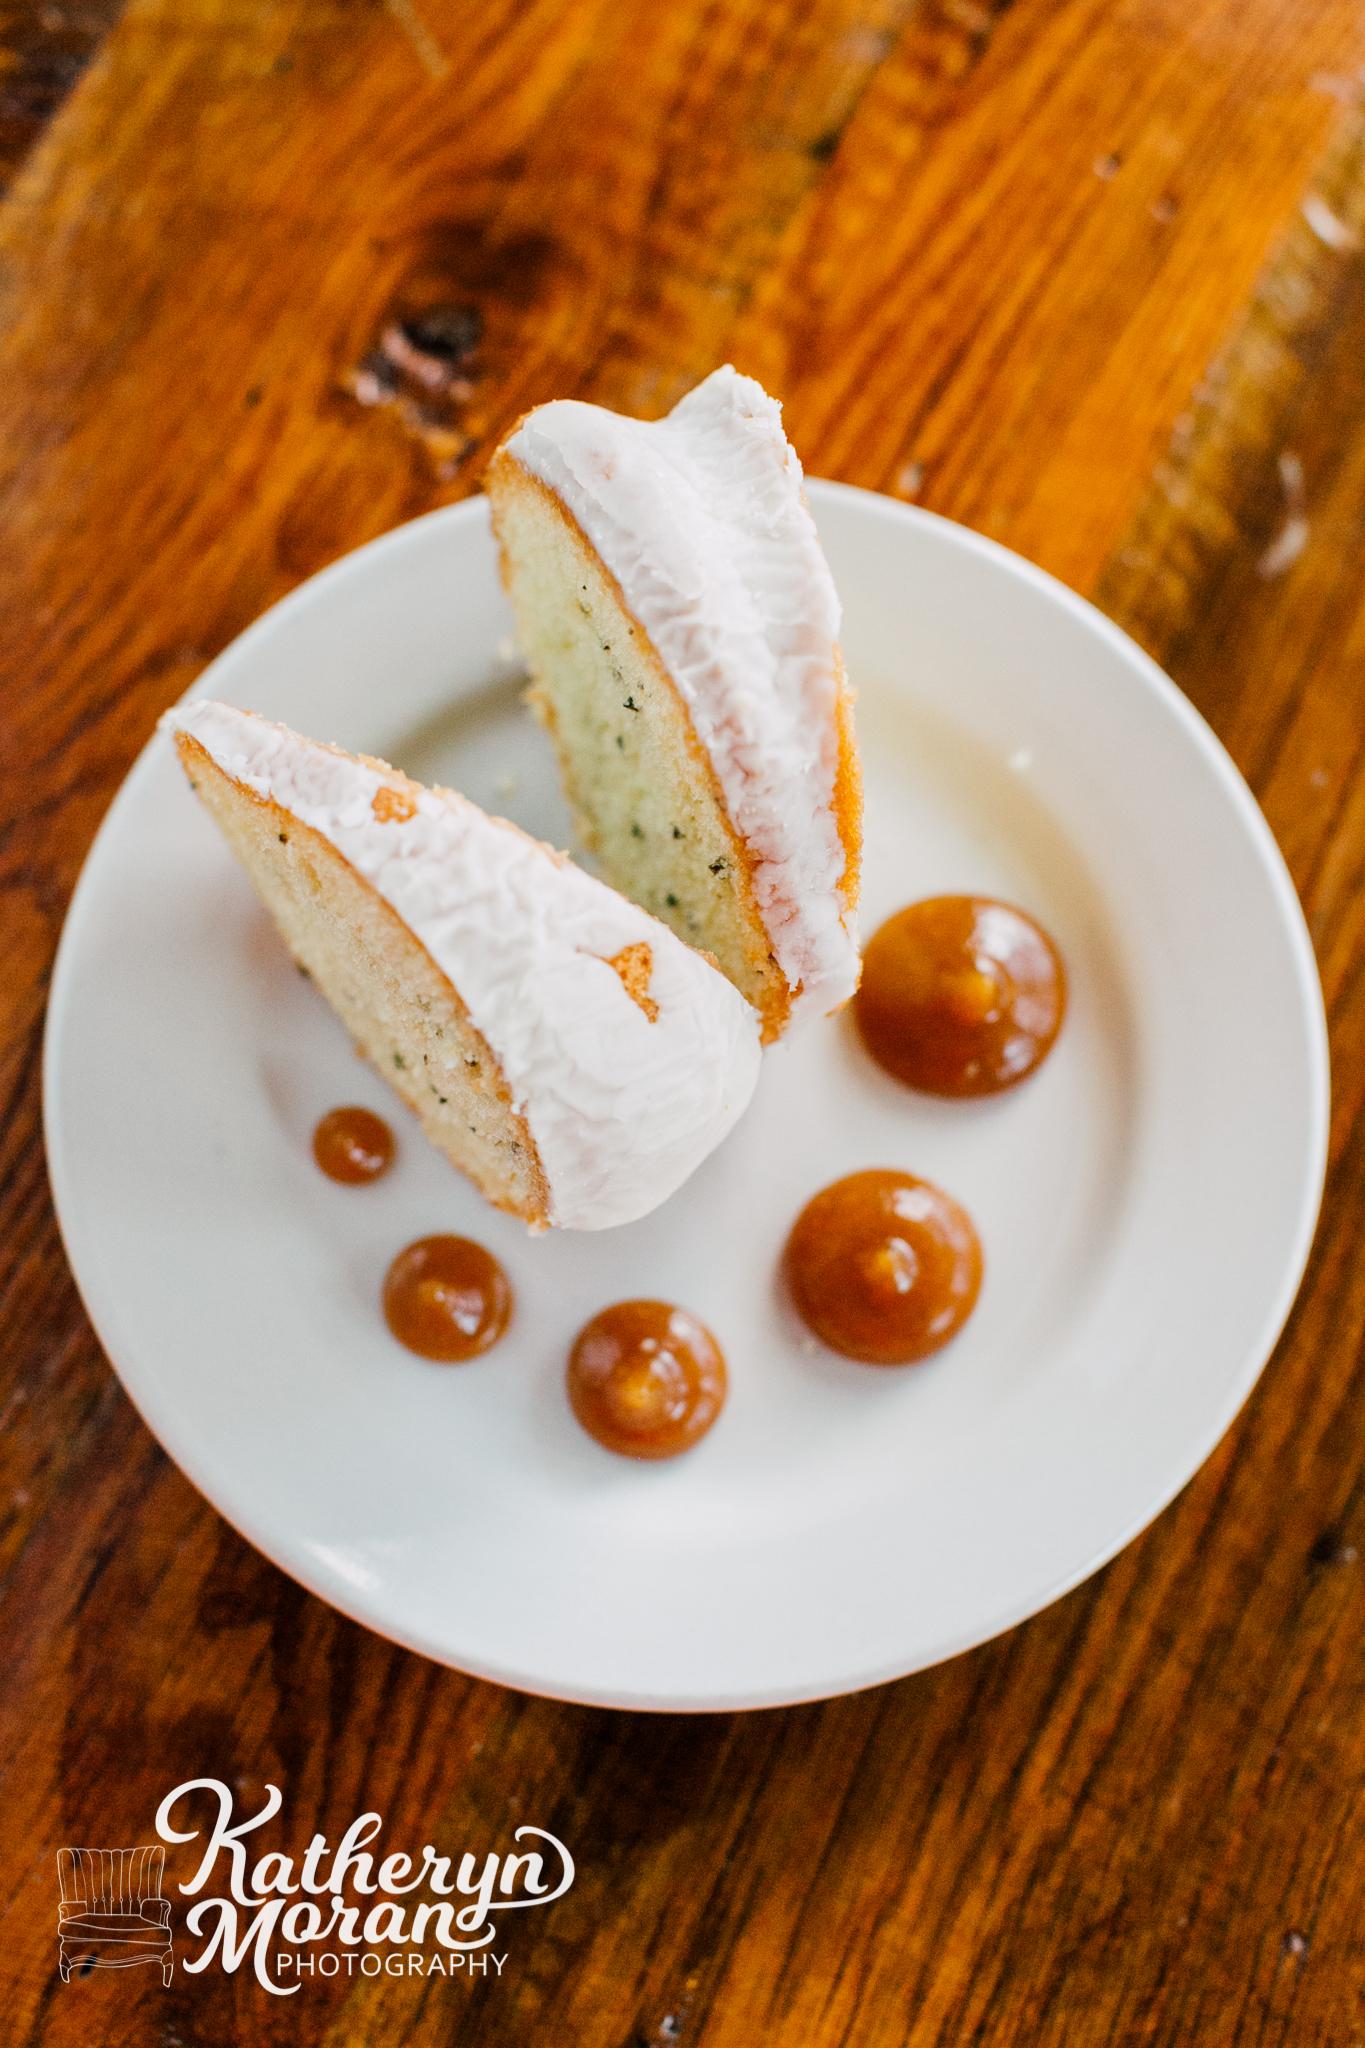 seattle-food-photographer-katheryn-moran-due-cucuina-italiana-2018-16.jpg